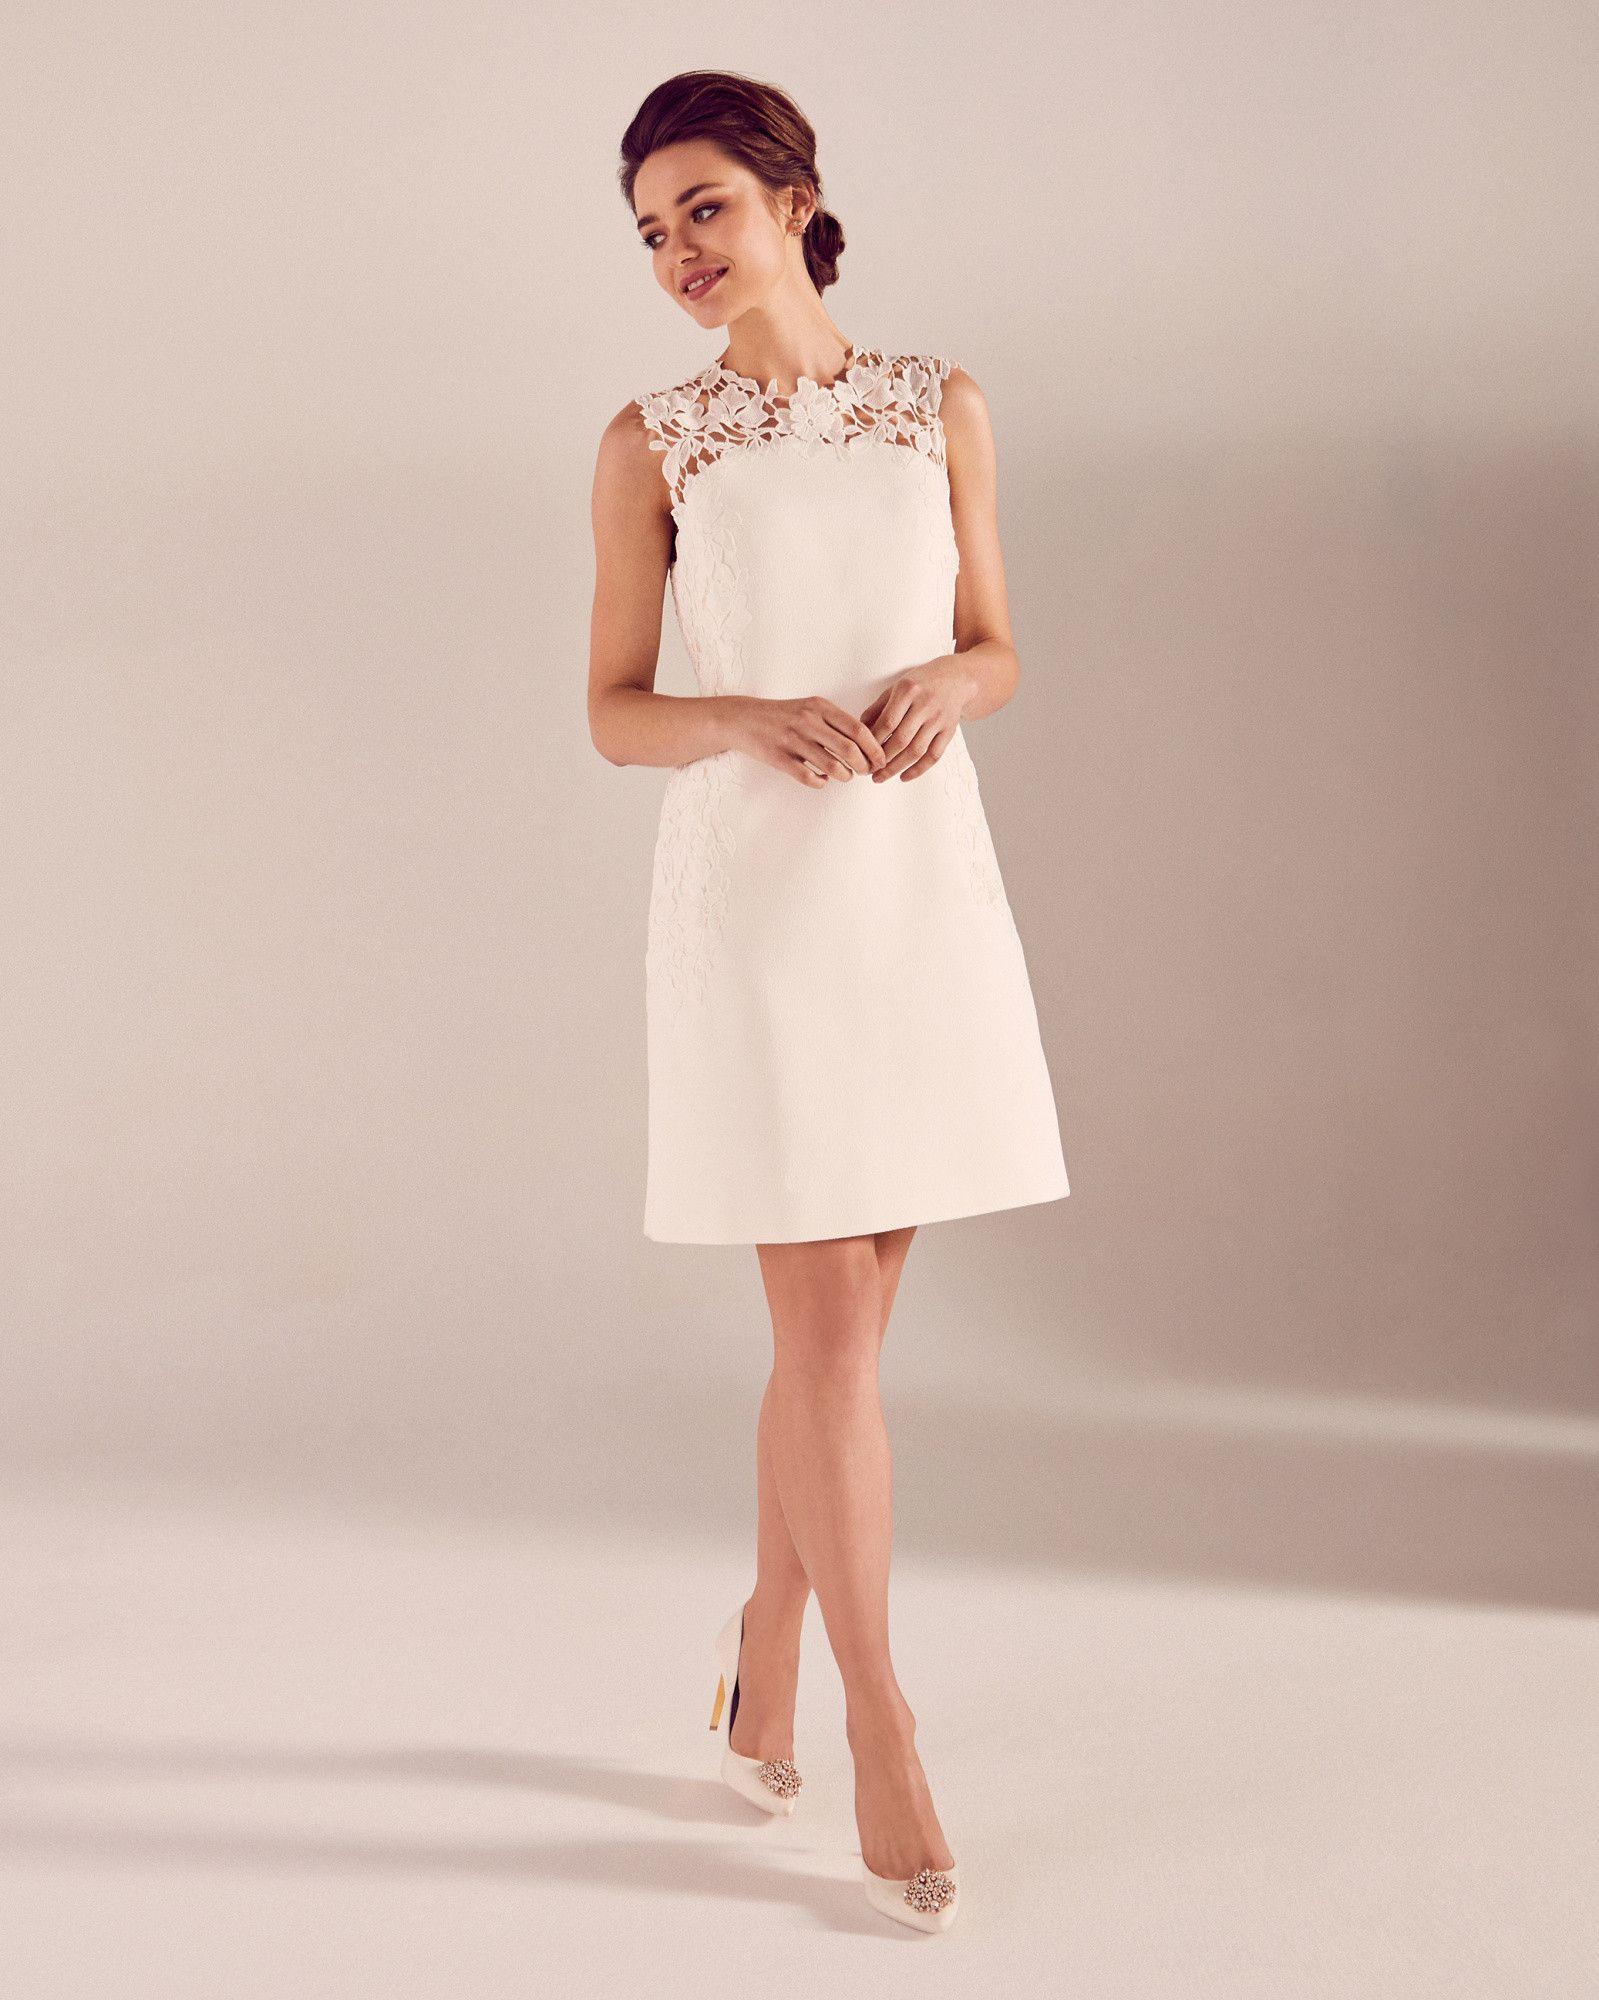 Embroidered Lace Shift Dress White Dresses Ted Baker Weisses Spitzenkleid Etuikleid Weisses Kleid